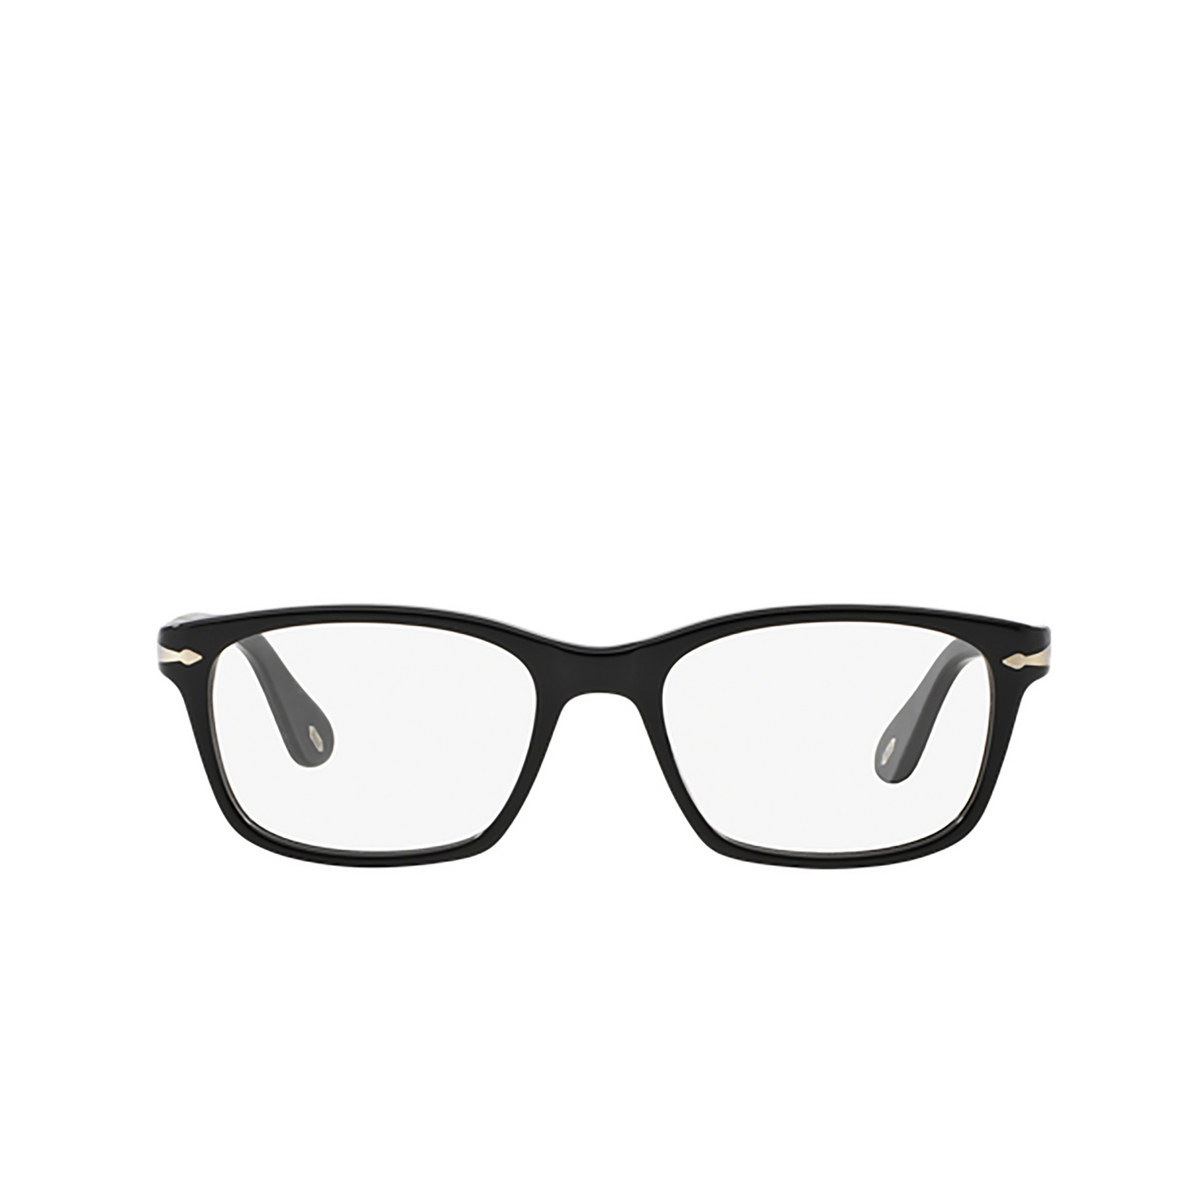 Persol® Square Eyeglasses: PO3012V color Black 95 - front view.